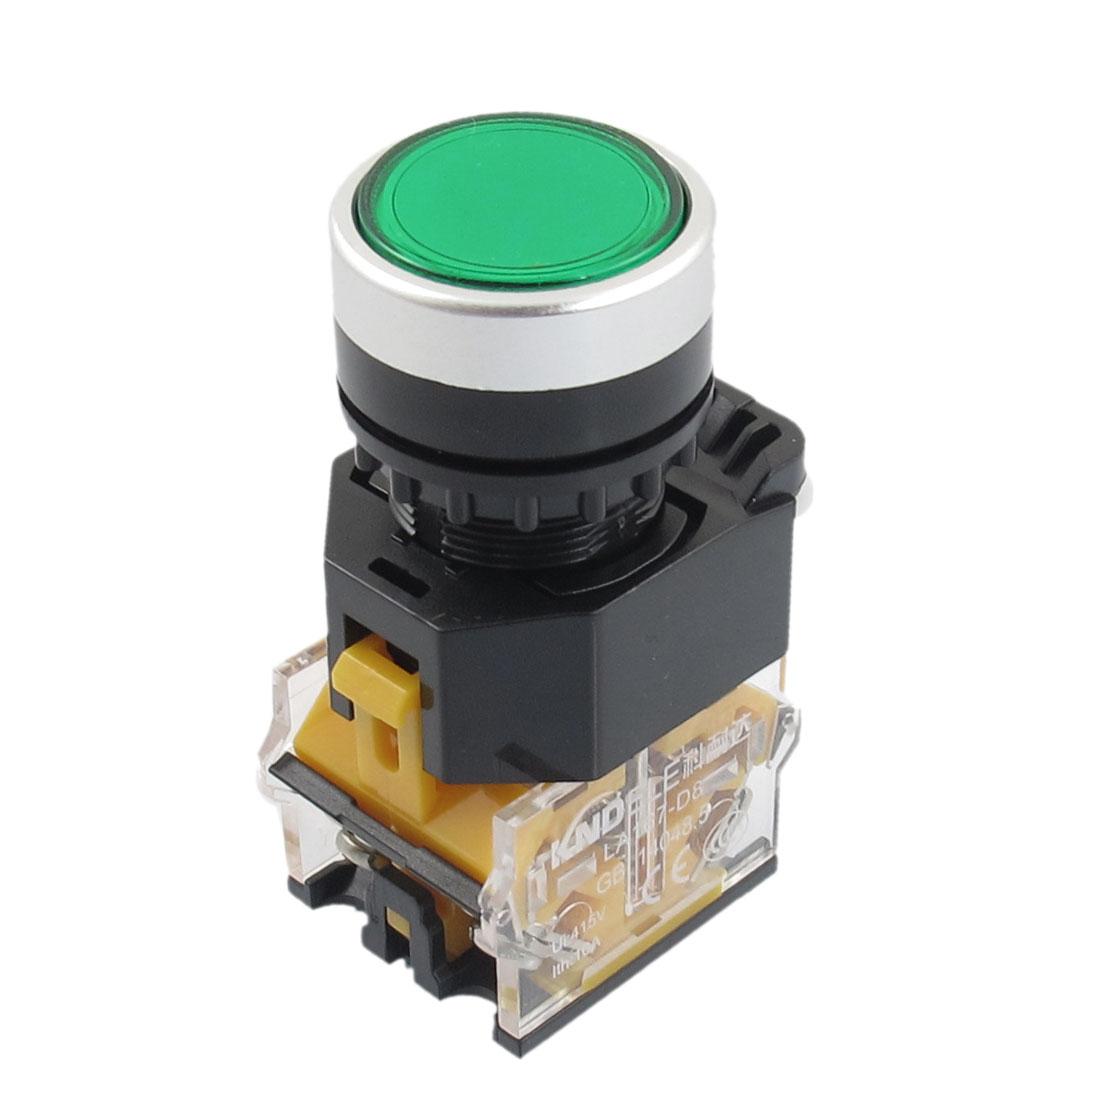 415V 10A Green Sign Latching Push Button Switch 22mm 1 NO 1 NC